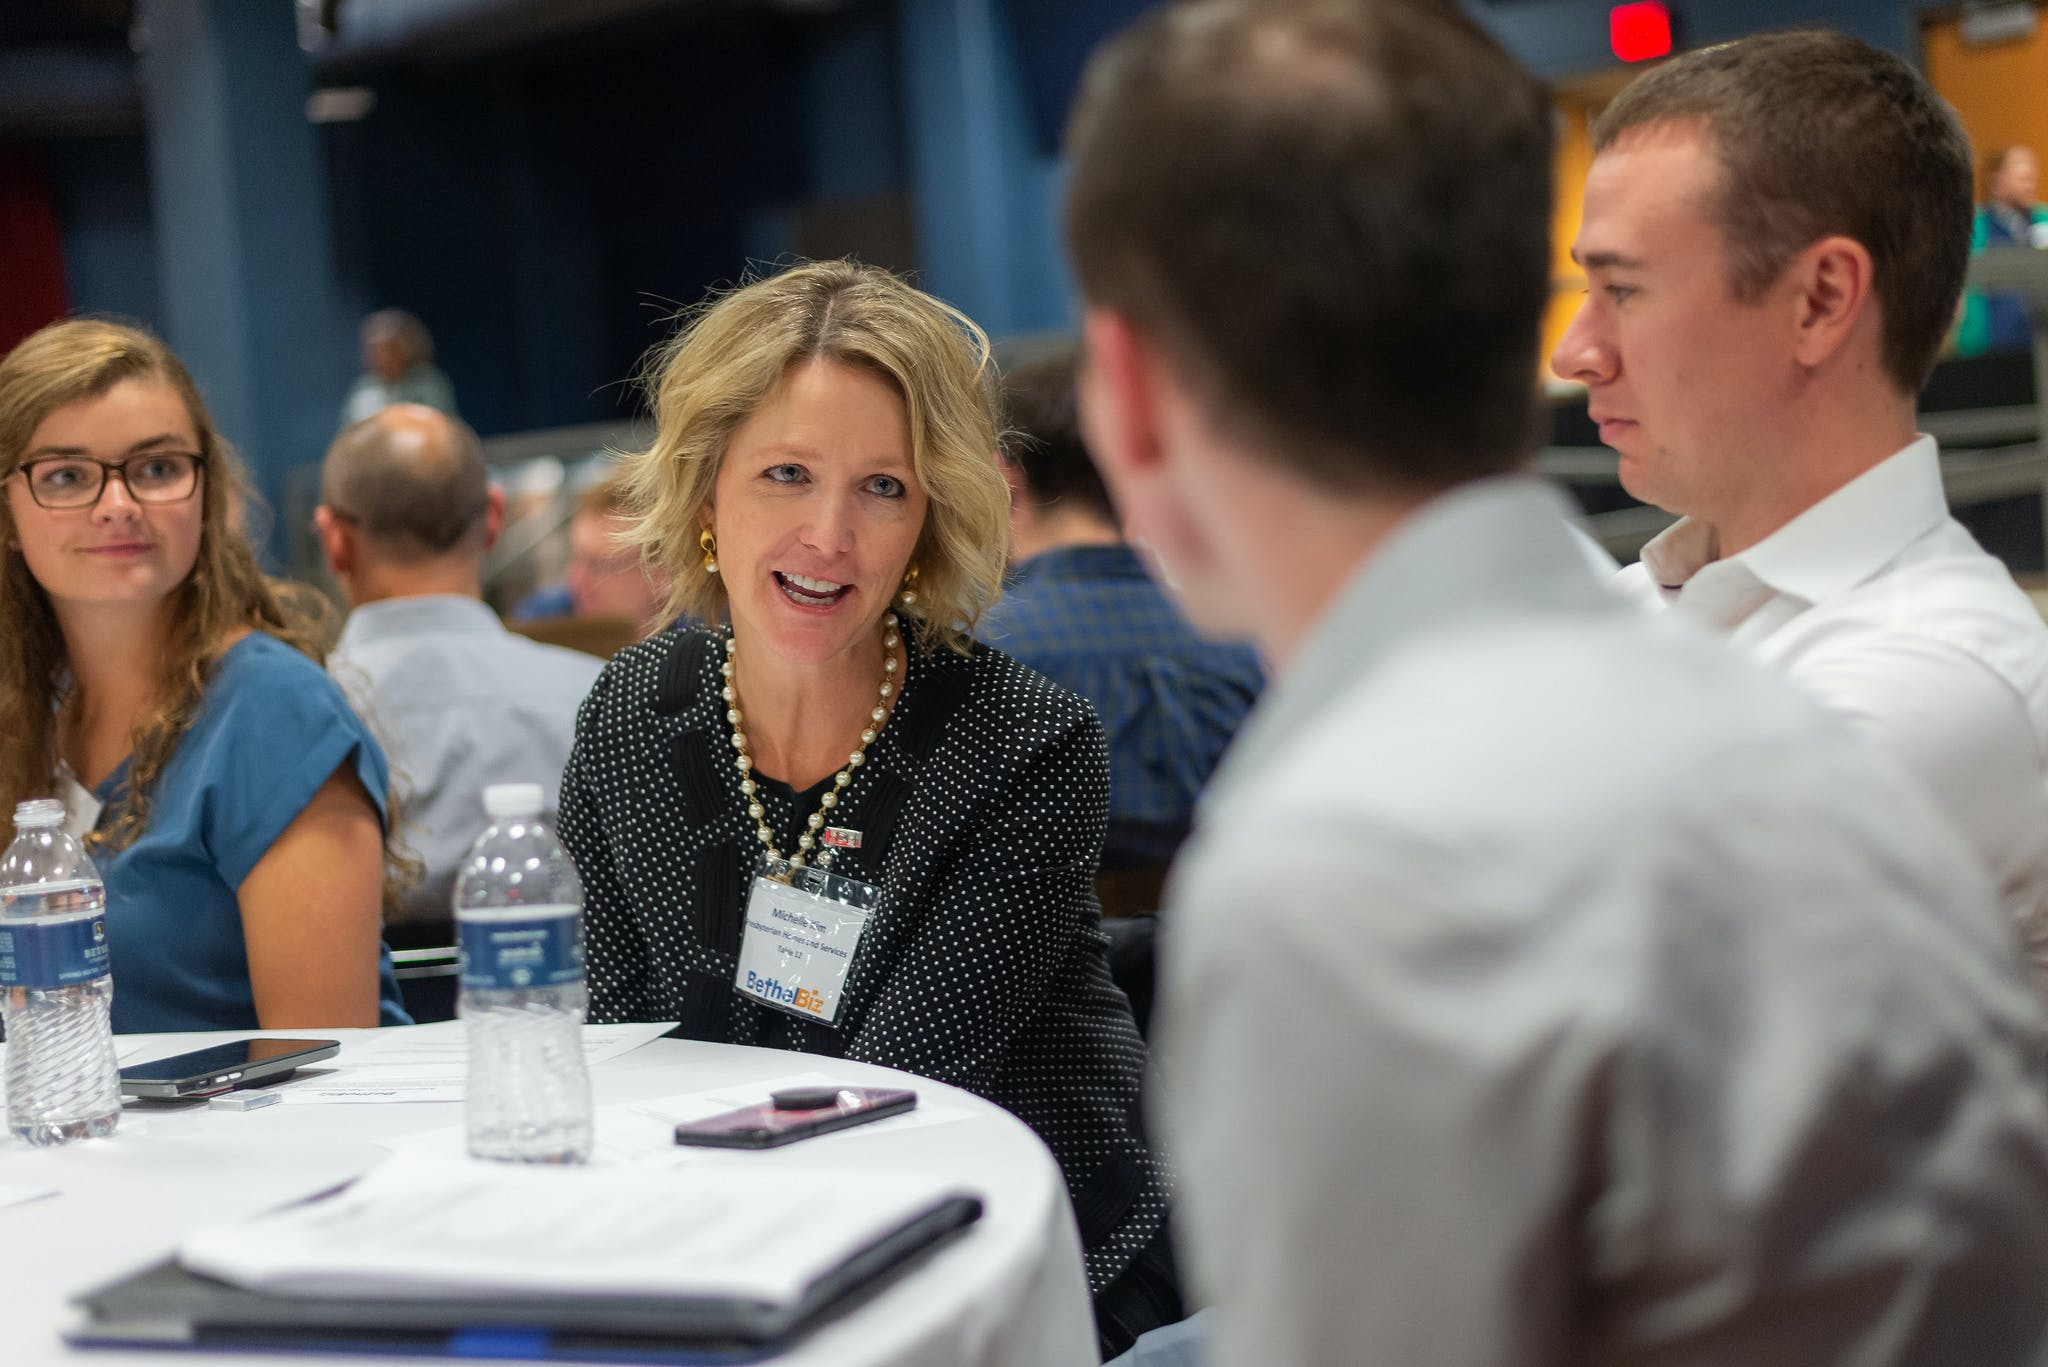 Bethel Students Build Professional Connections Through Alumni Mentorships